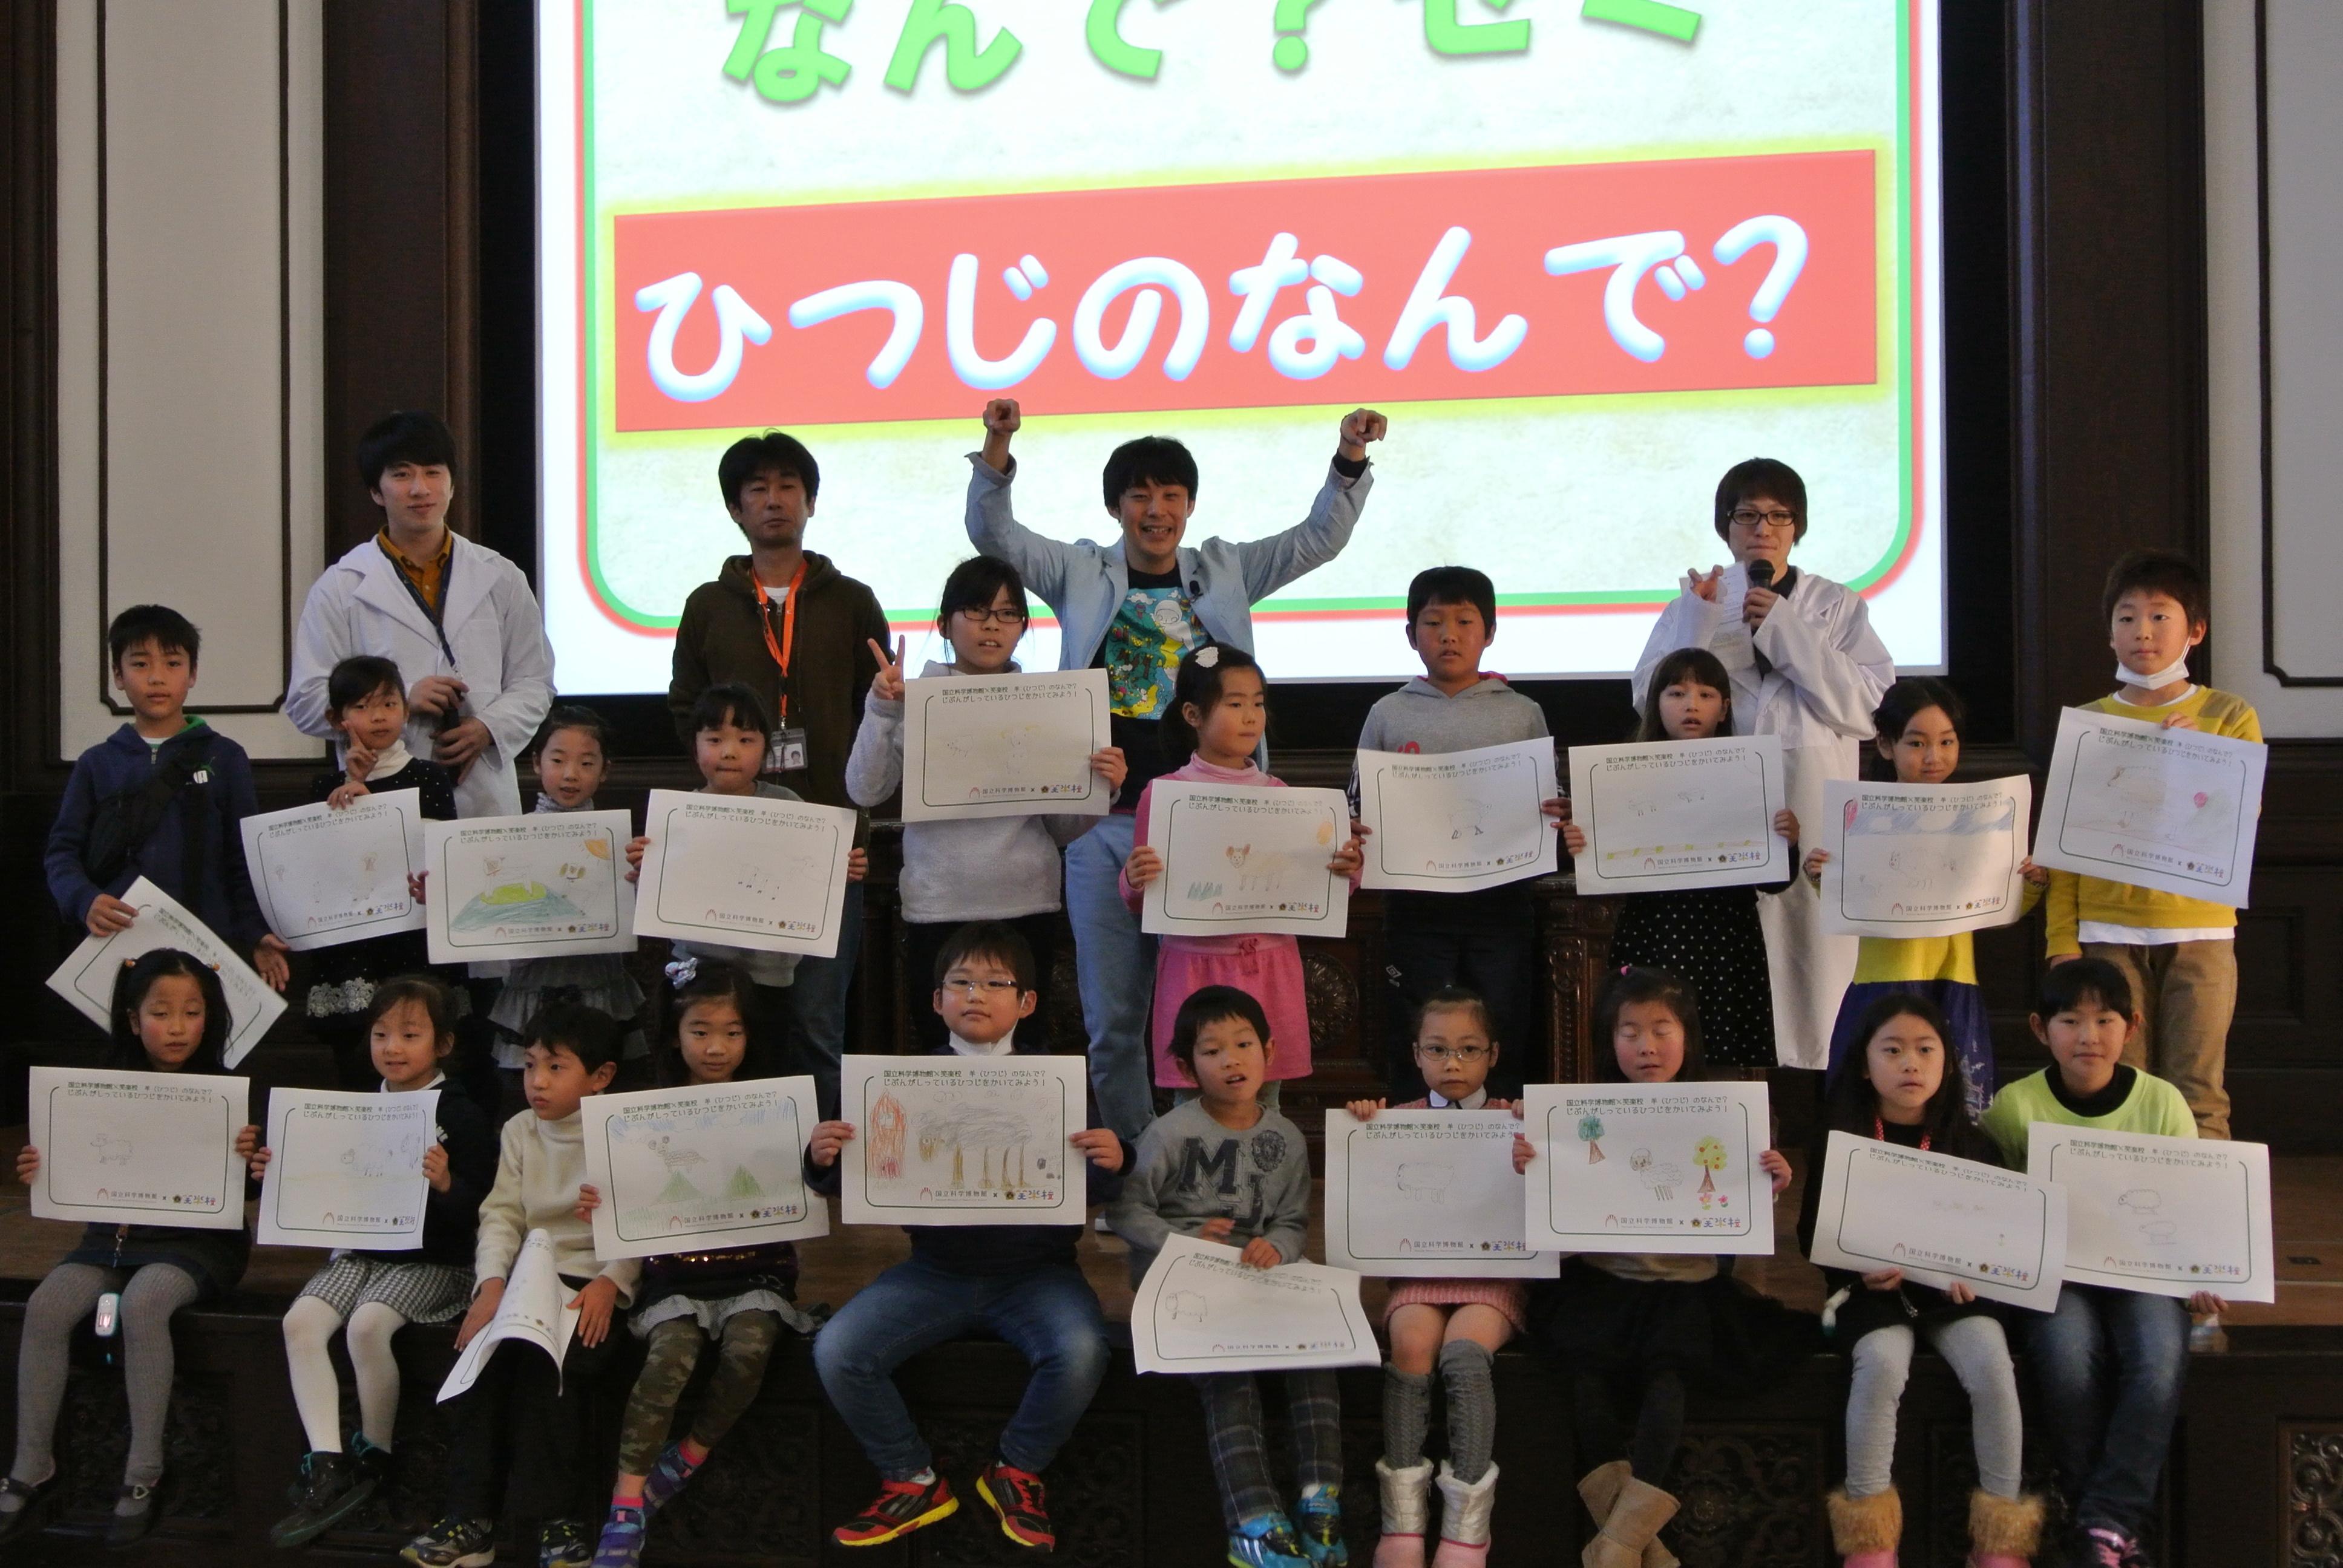 http://news.yoshimoto.co.jp/photos/uncategorized/2014/12/30/20141230185320-314086b14ba0ea03e3abfa1658548af789c7cb12.jpg